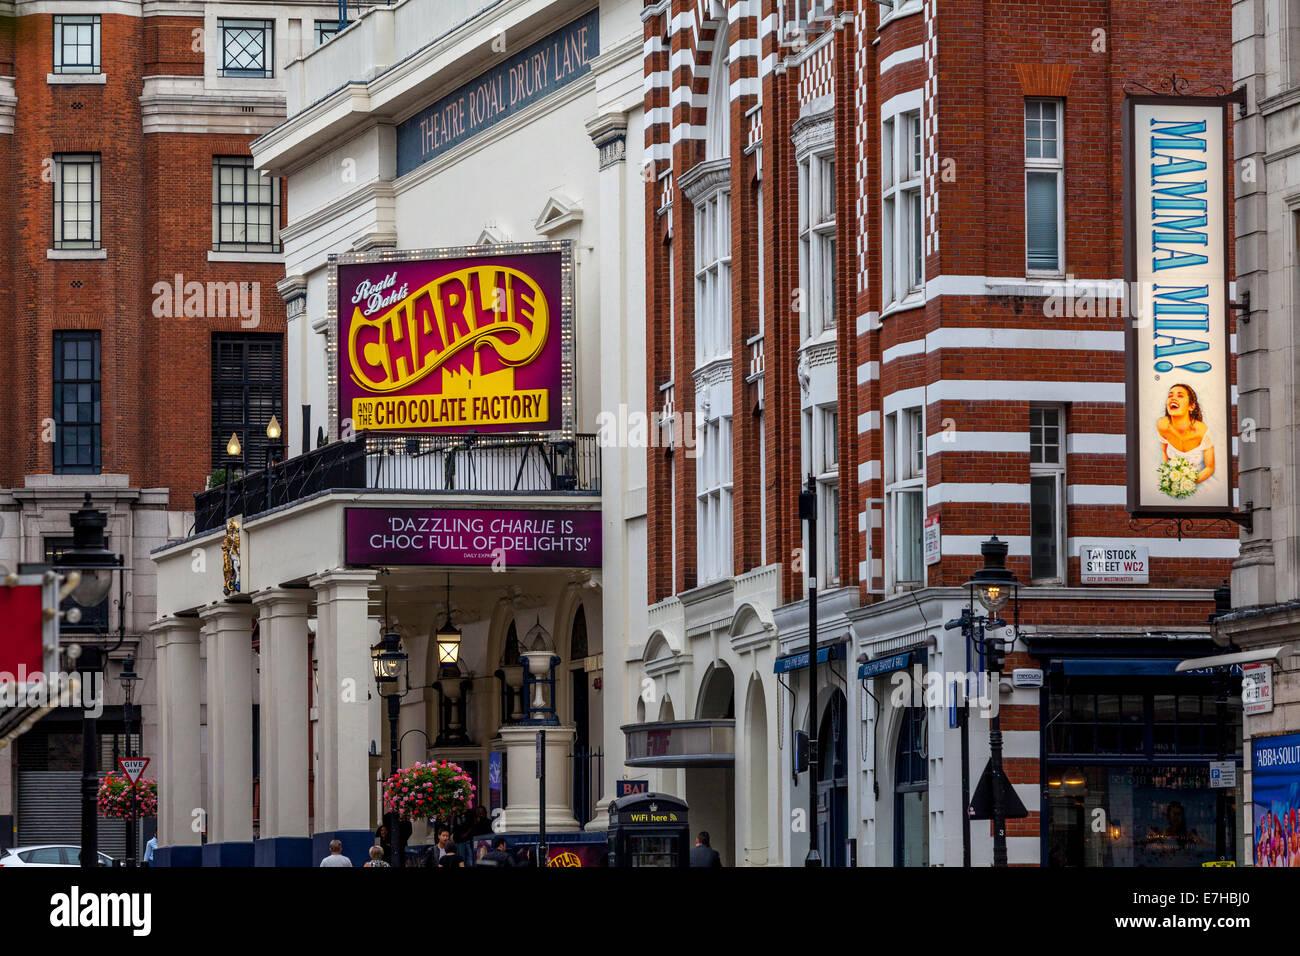 Theatre Royal Drury Lane, London, England - Stock Image